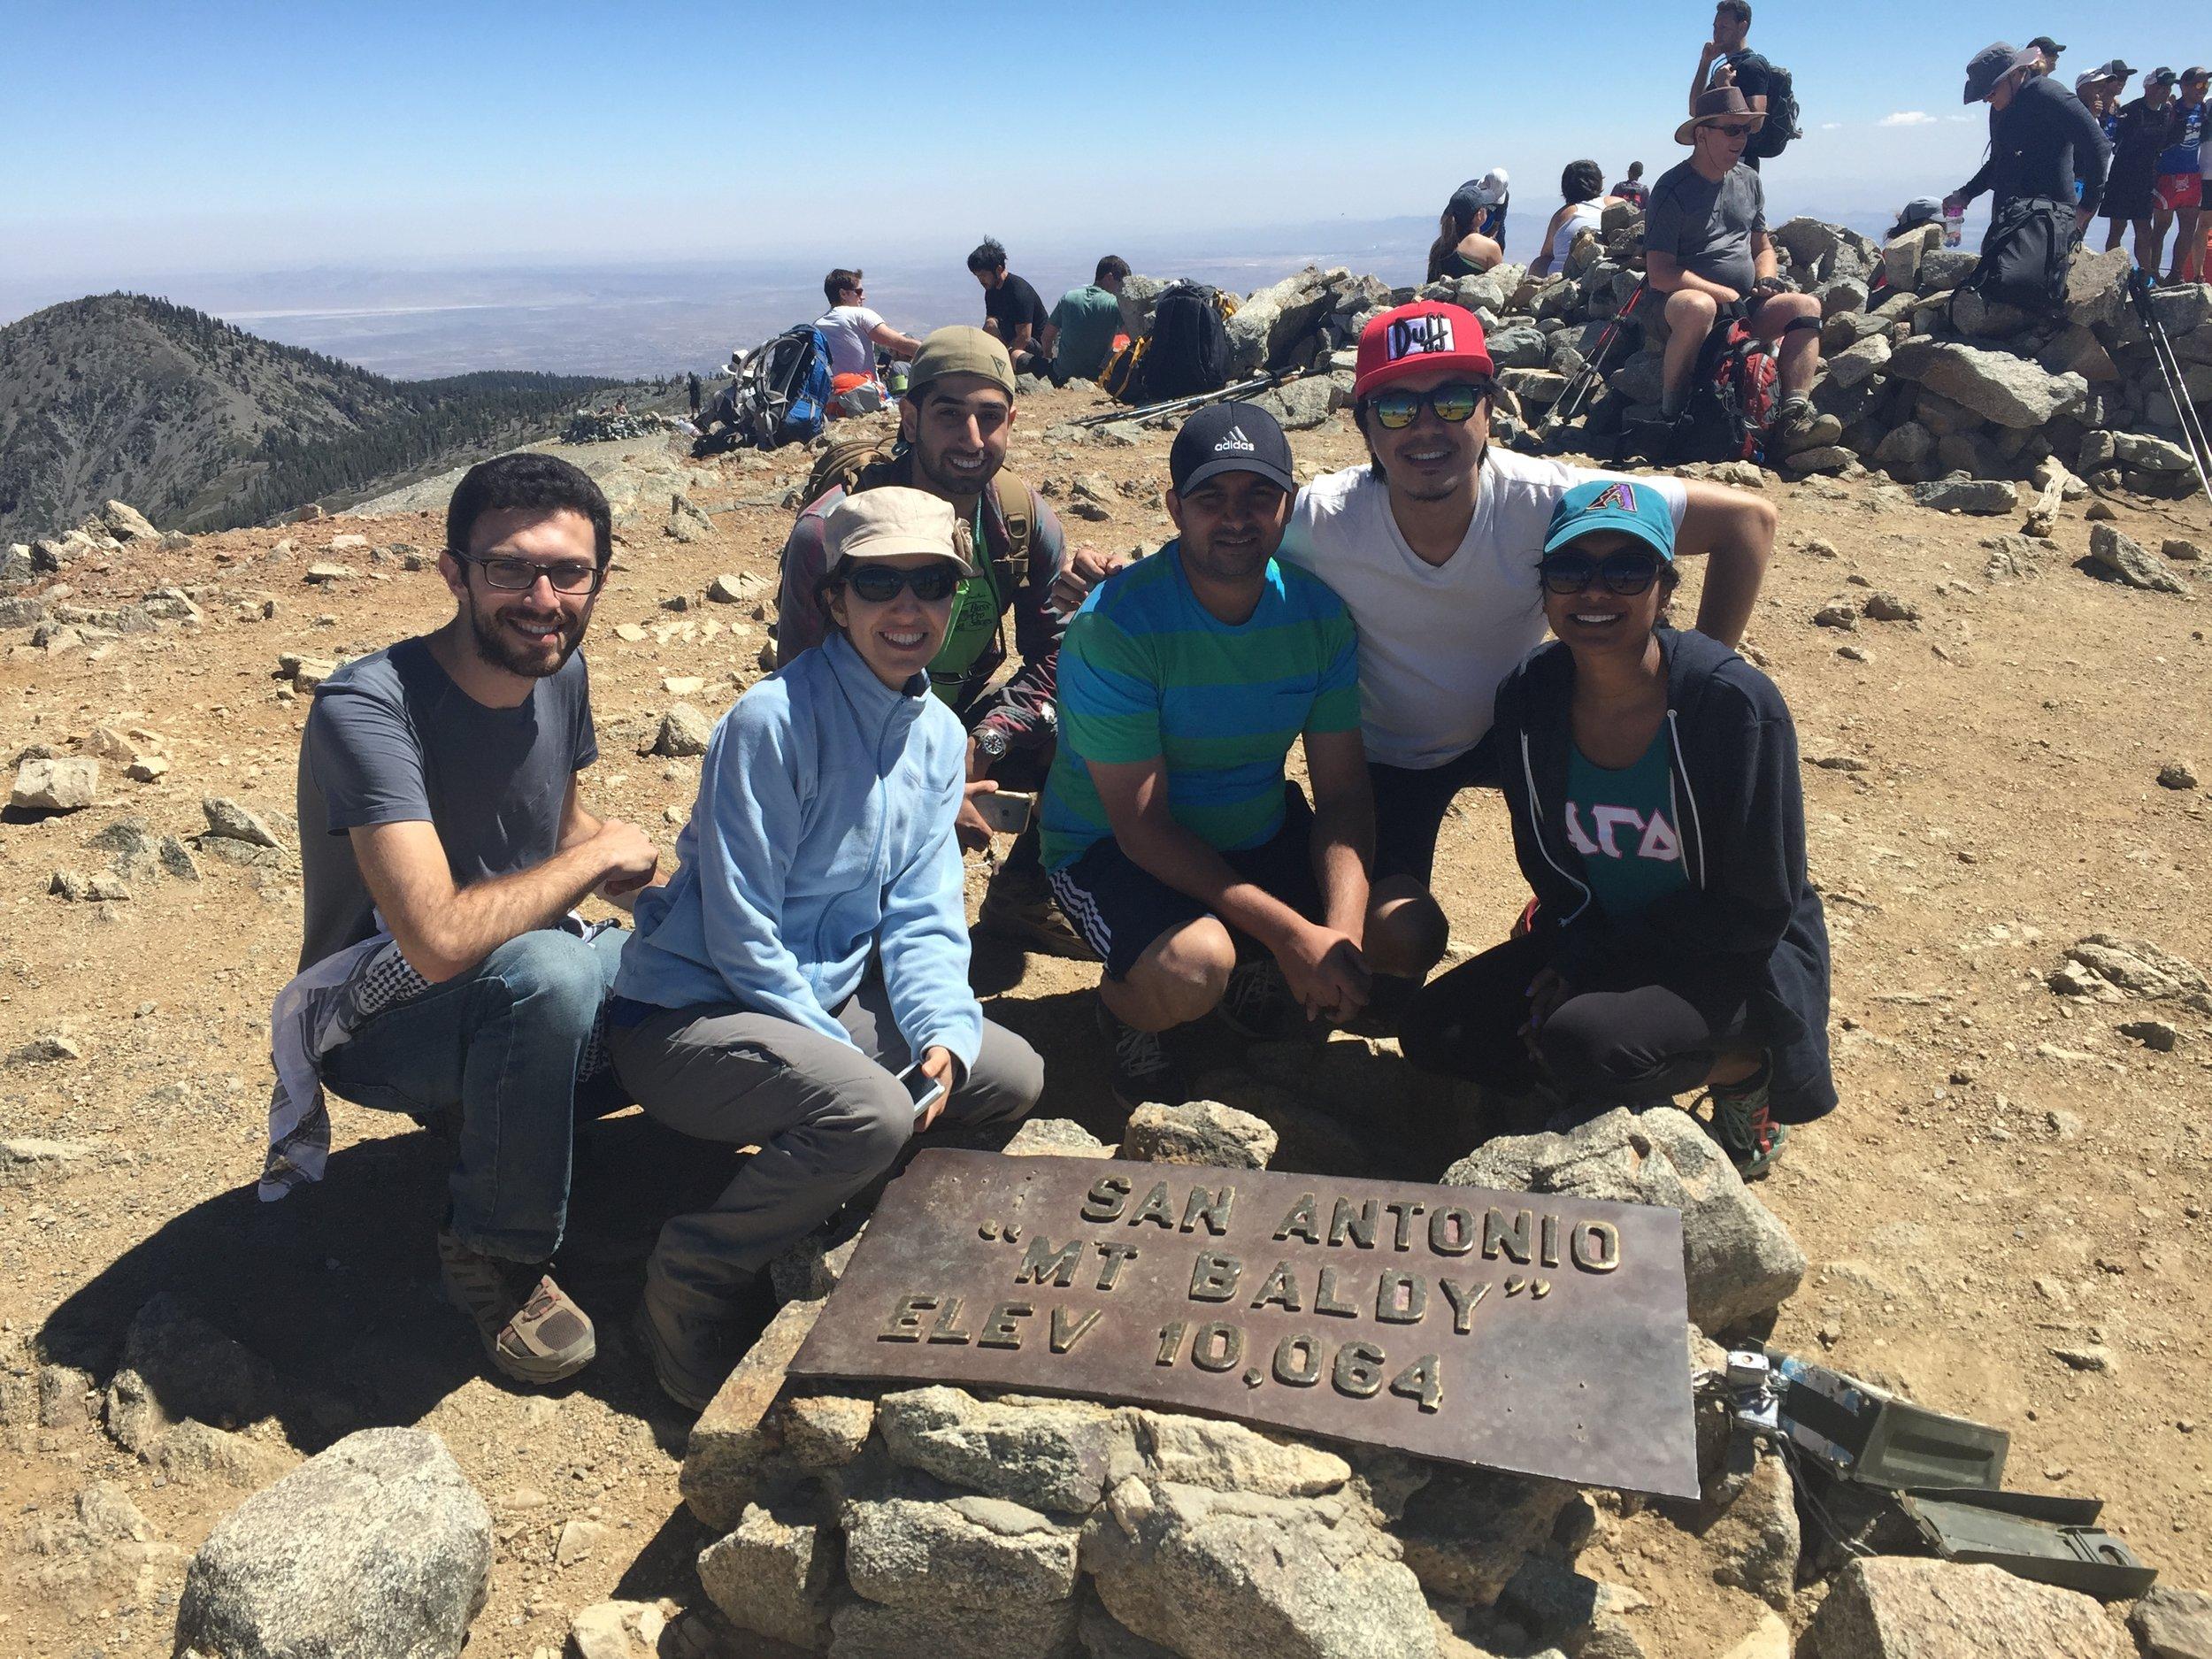 Summit of Mt. Baldy!